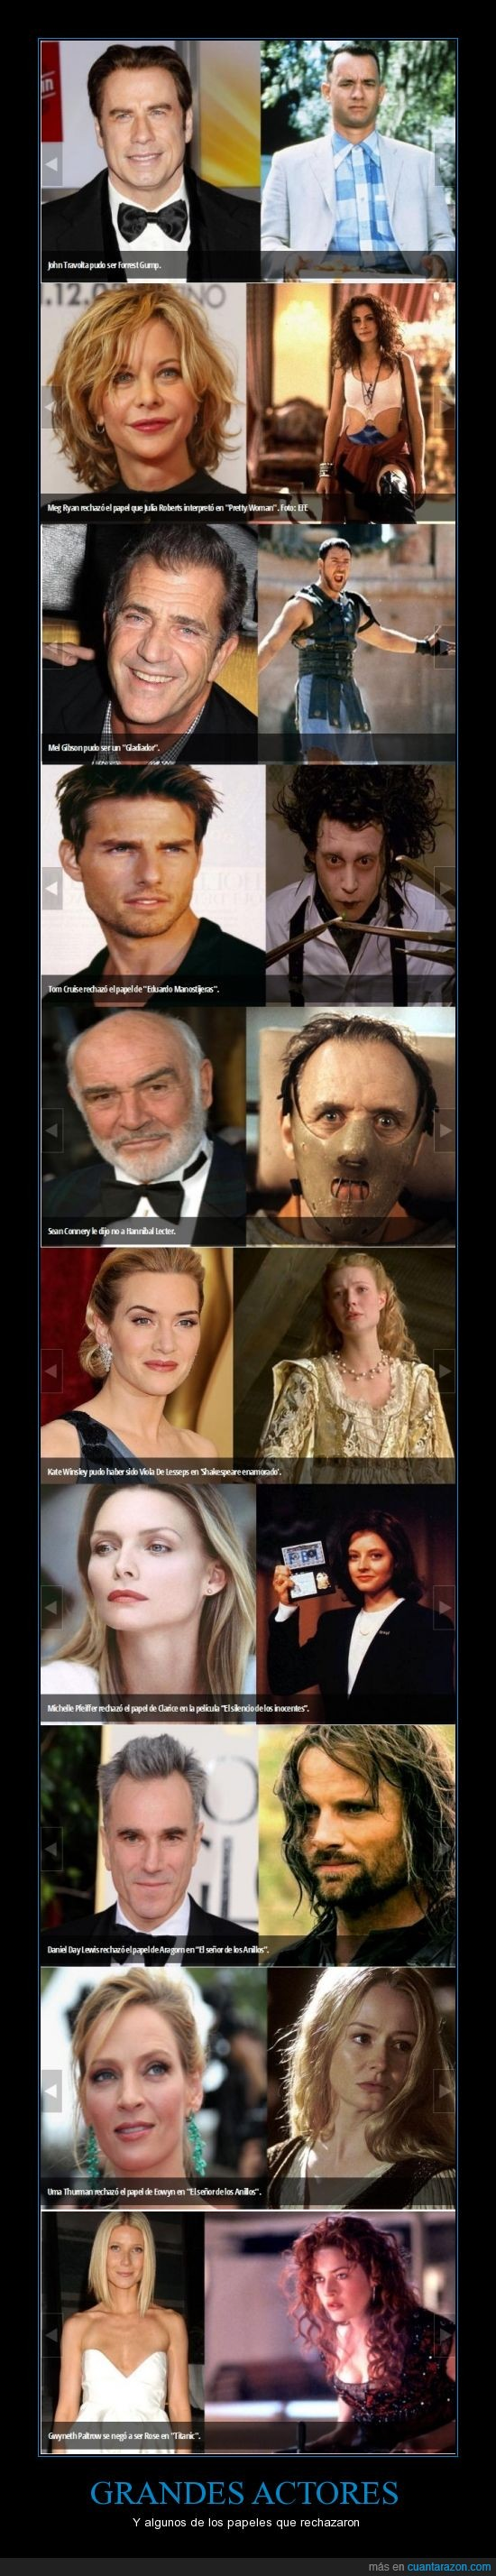 actores,eduardo manostijeras,forrest gump,gladiador,hannibal lecter,john travolta,lord of the rings,personajes,titanic